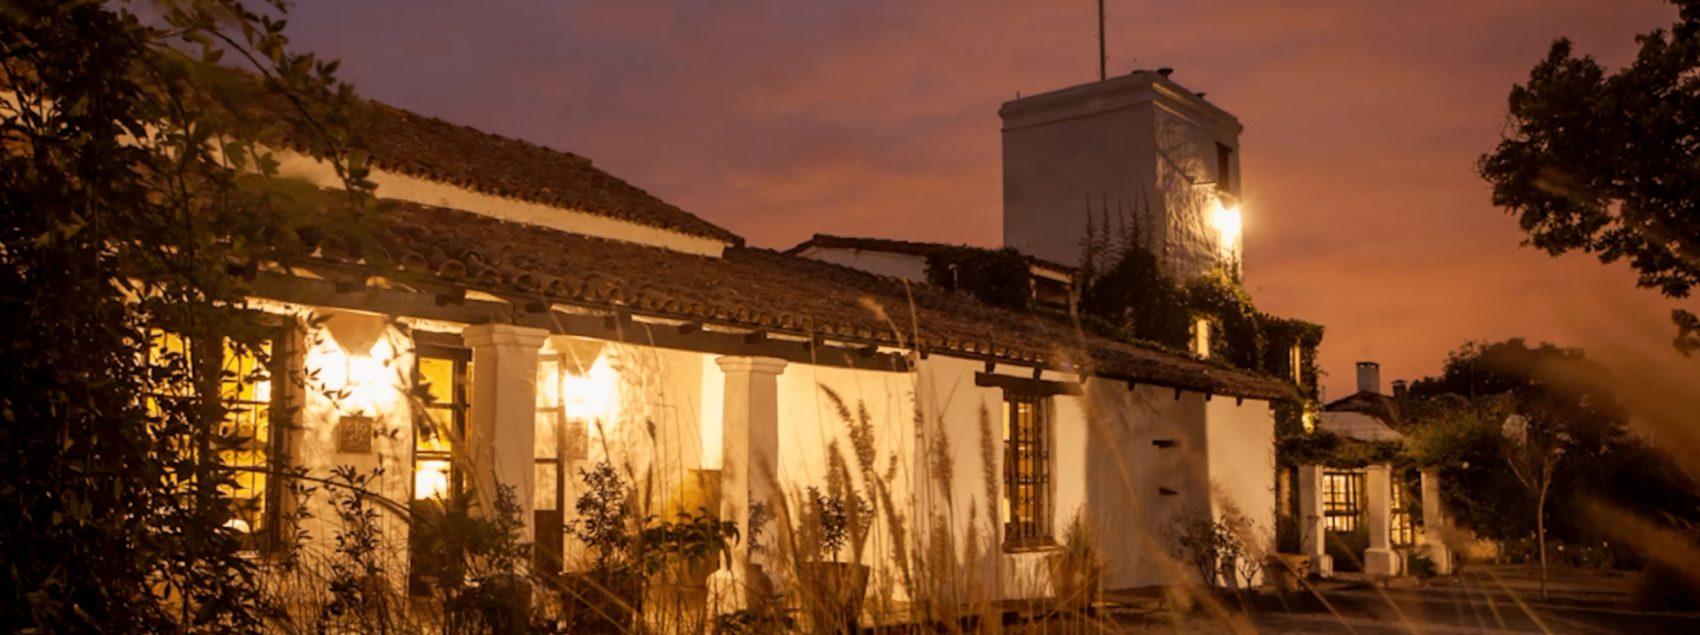 House of Jasmines | Estancia House of Jasmines Salta Argentina